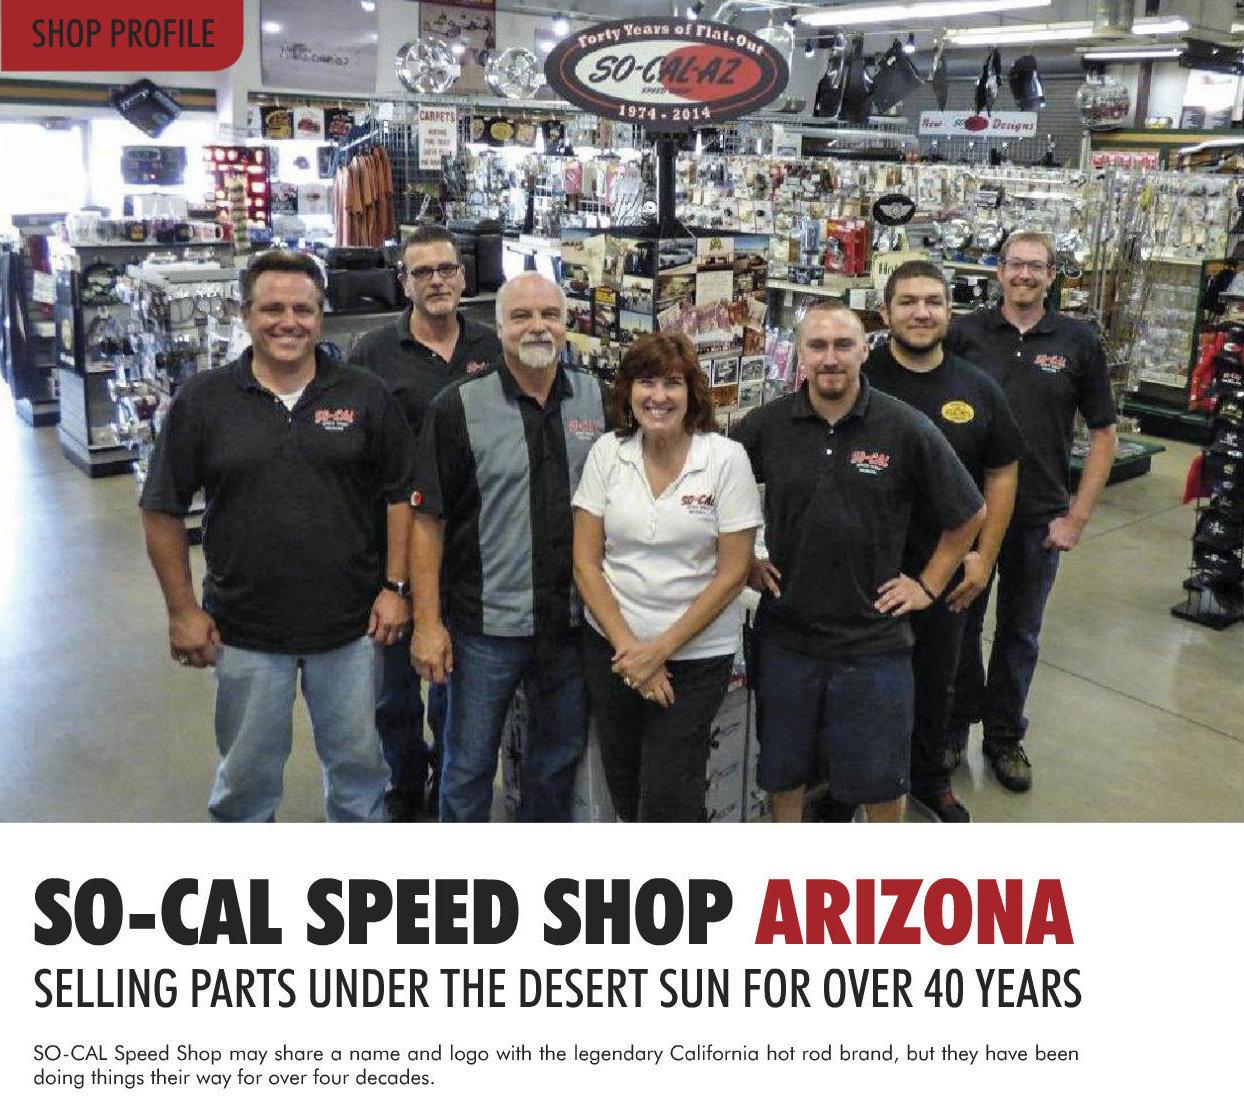 13.0-so-cal-speed-shop-arizona-goodguys-gazette-april-2015.jpg